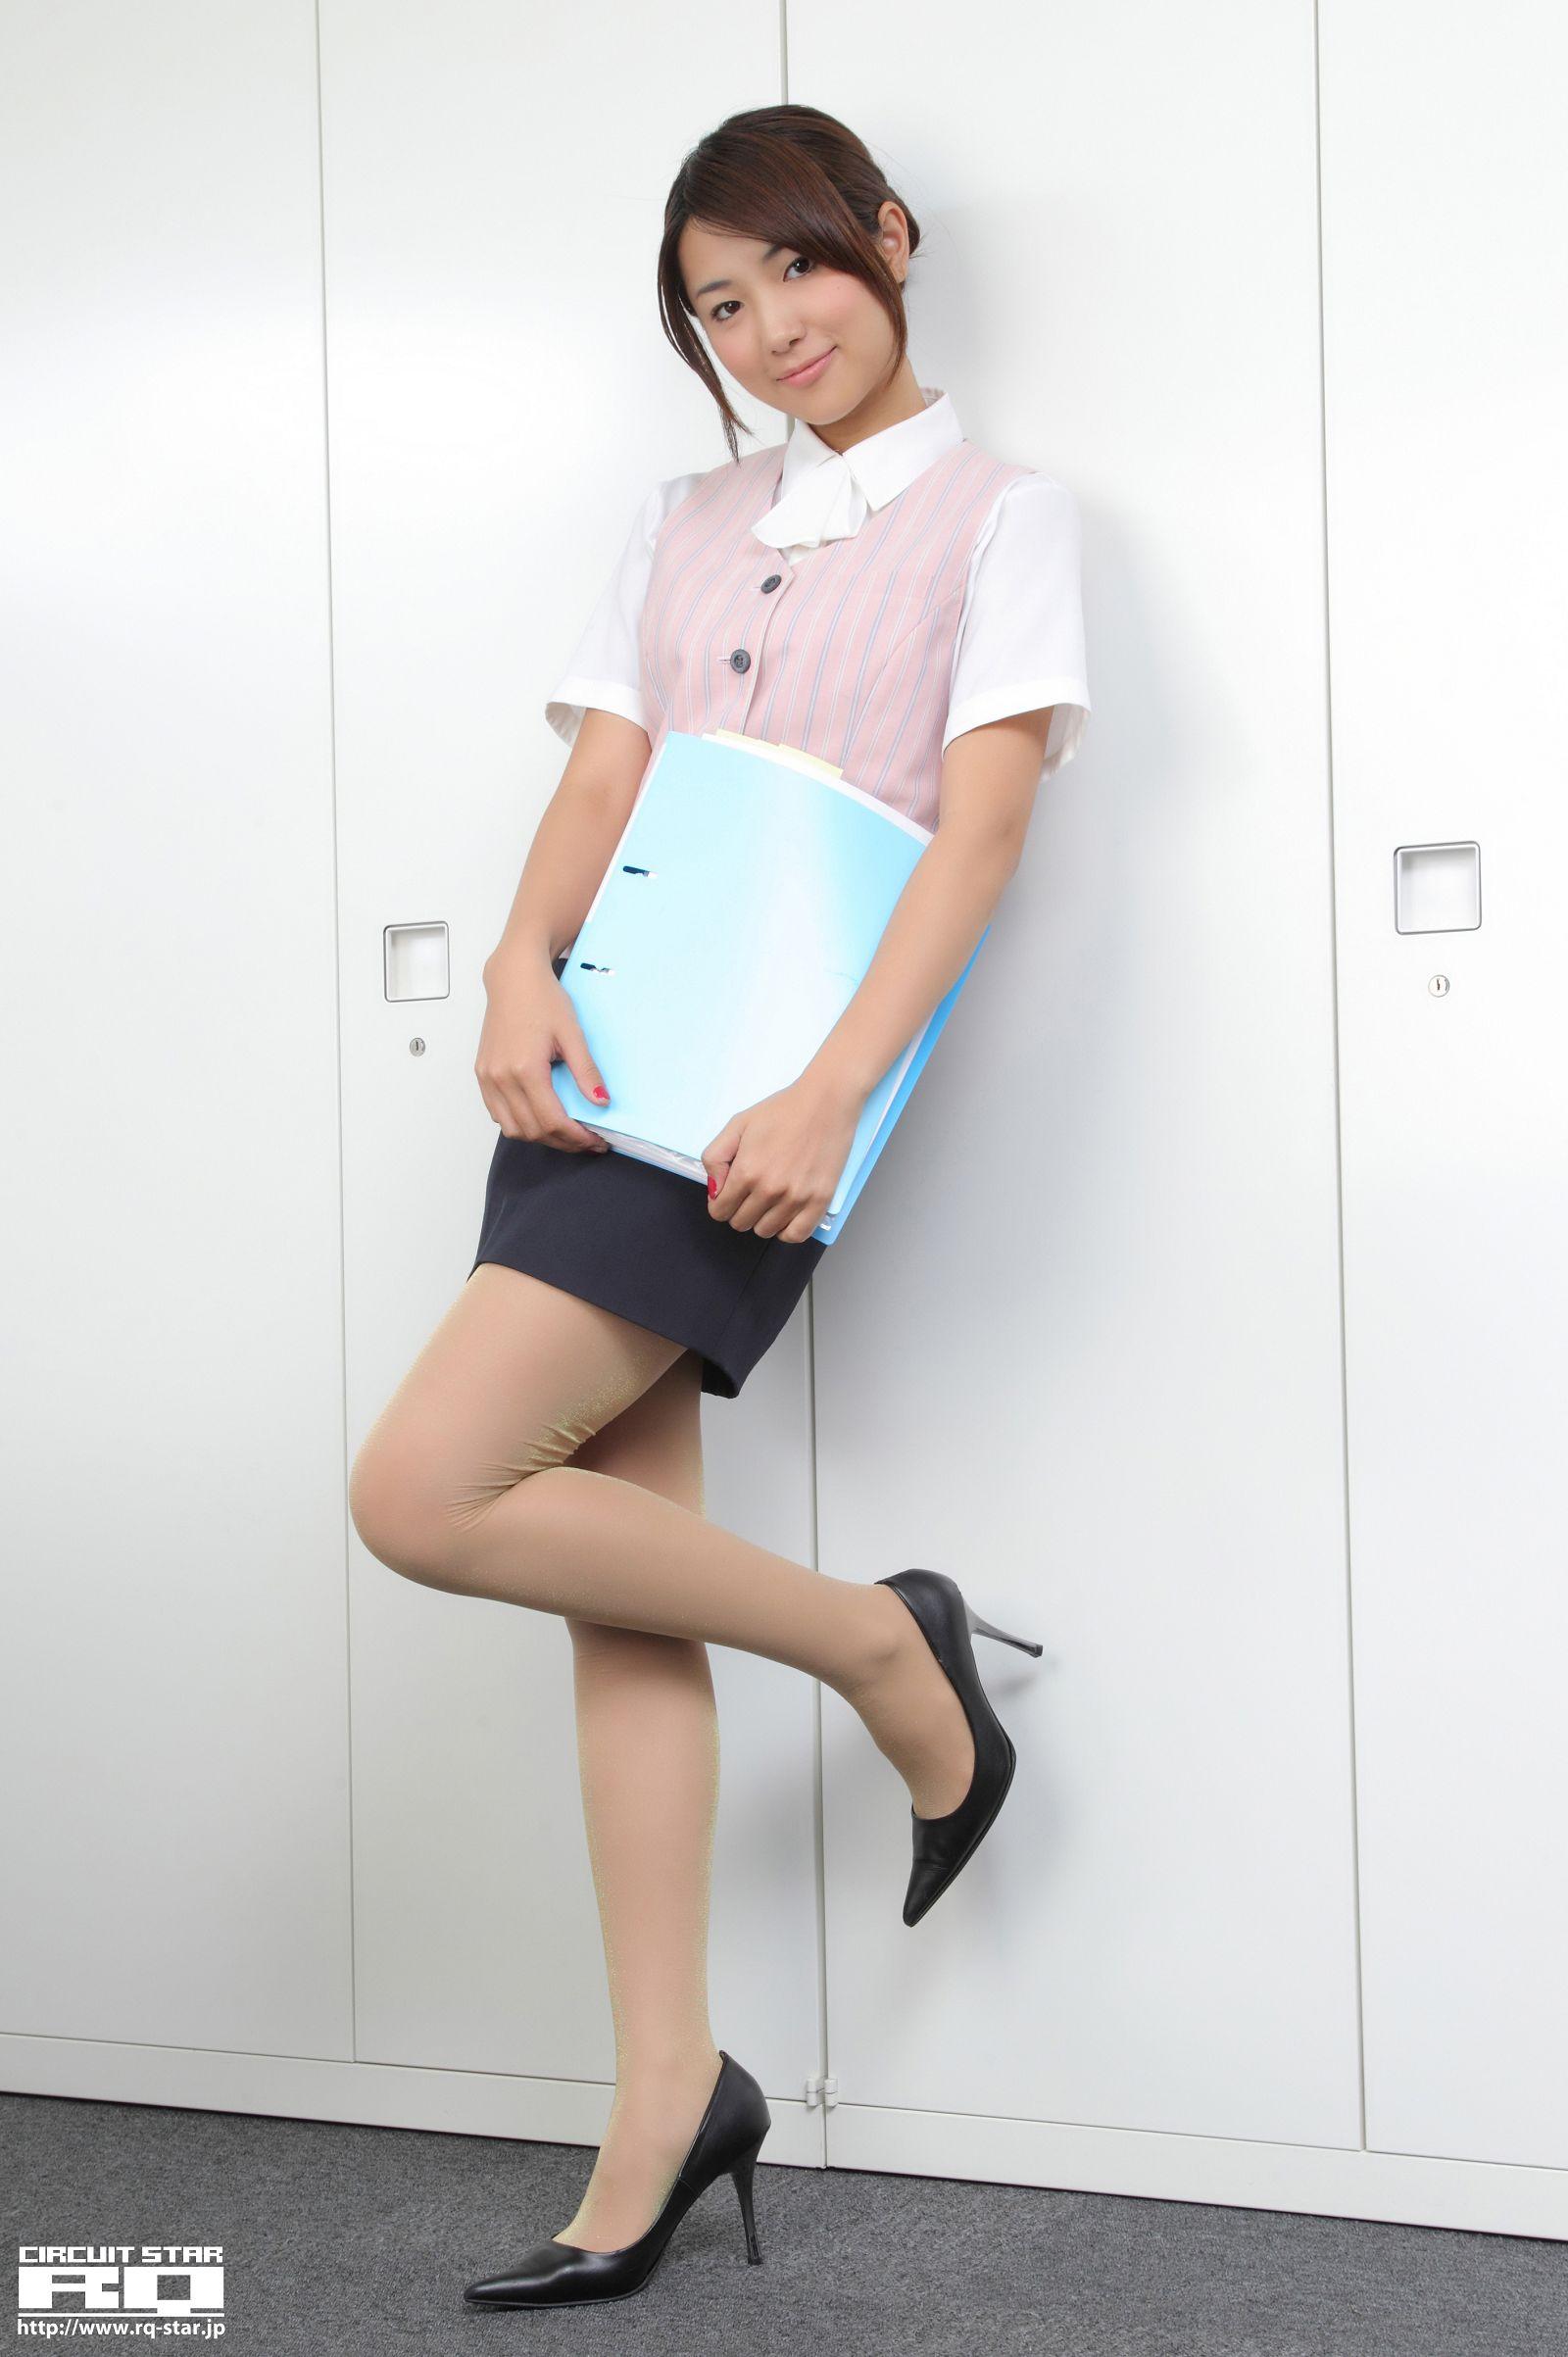 [RQ STAR美女] NO.00583 Naoho Ichihashi 市橋直歩 Office Lady[130P] RQ STAR 第1张